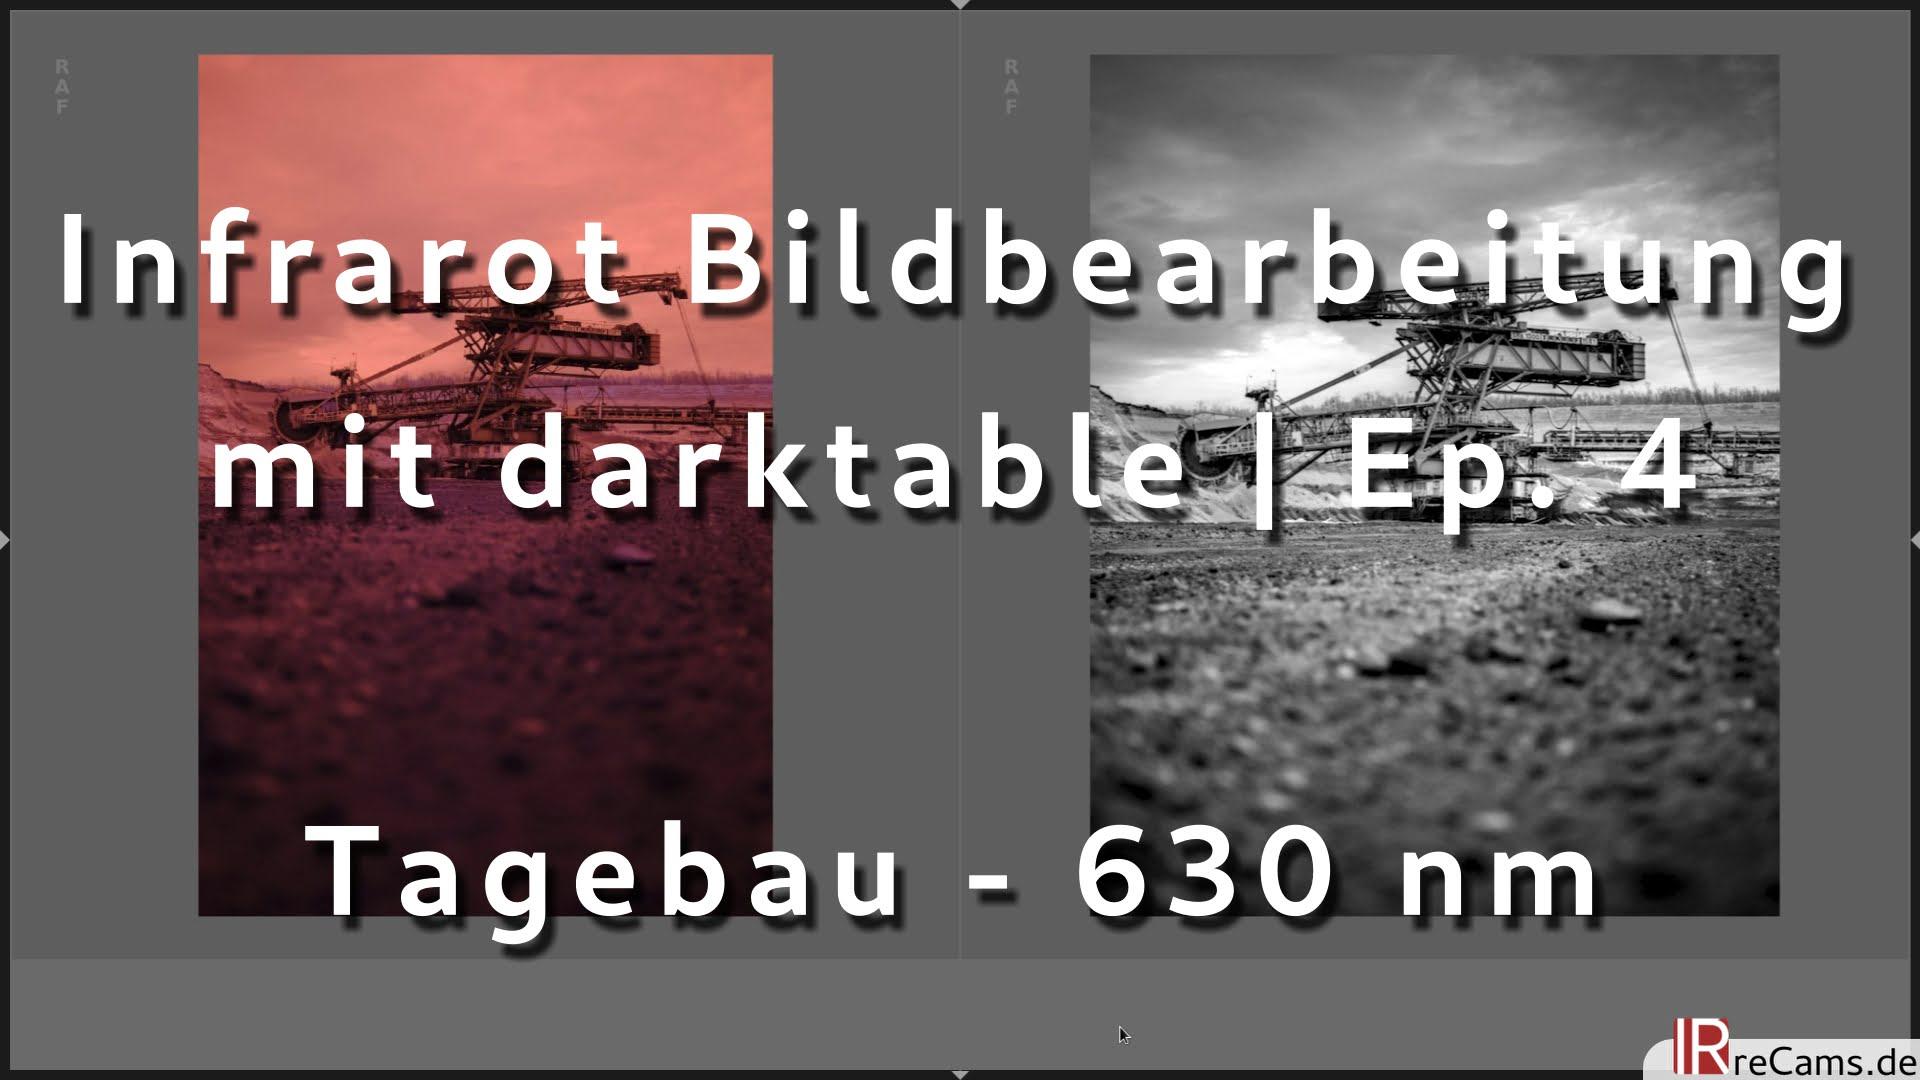 Infrarot Bildbearbeitung in darktable 3.0 | Ep. 4